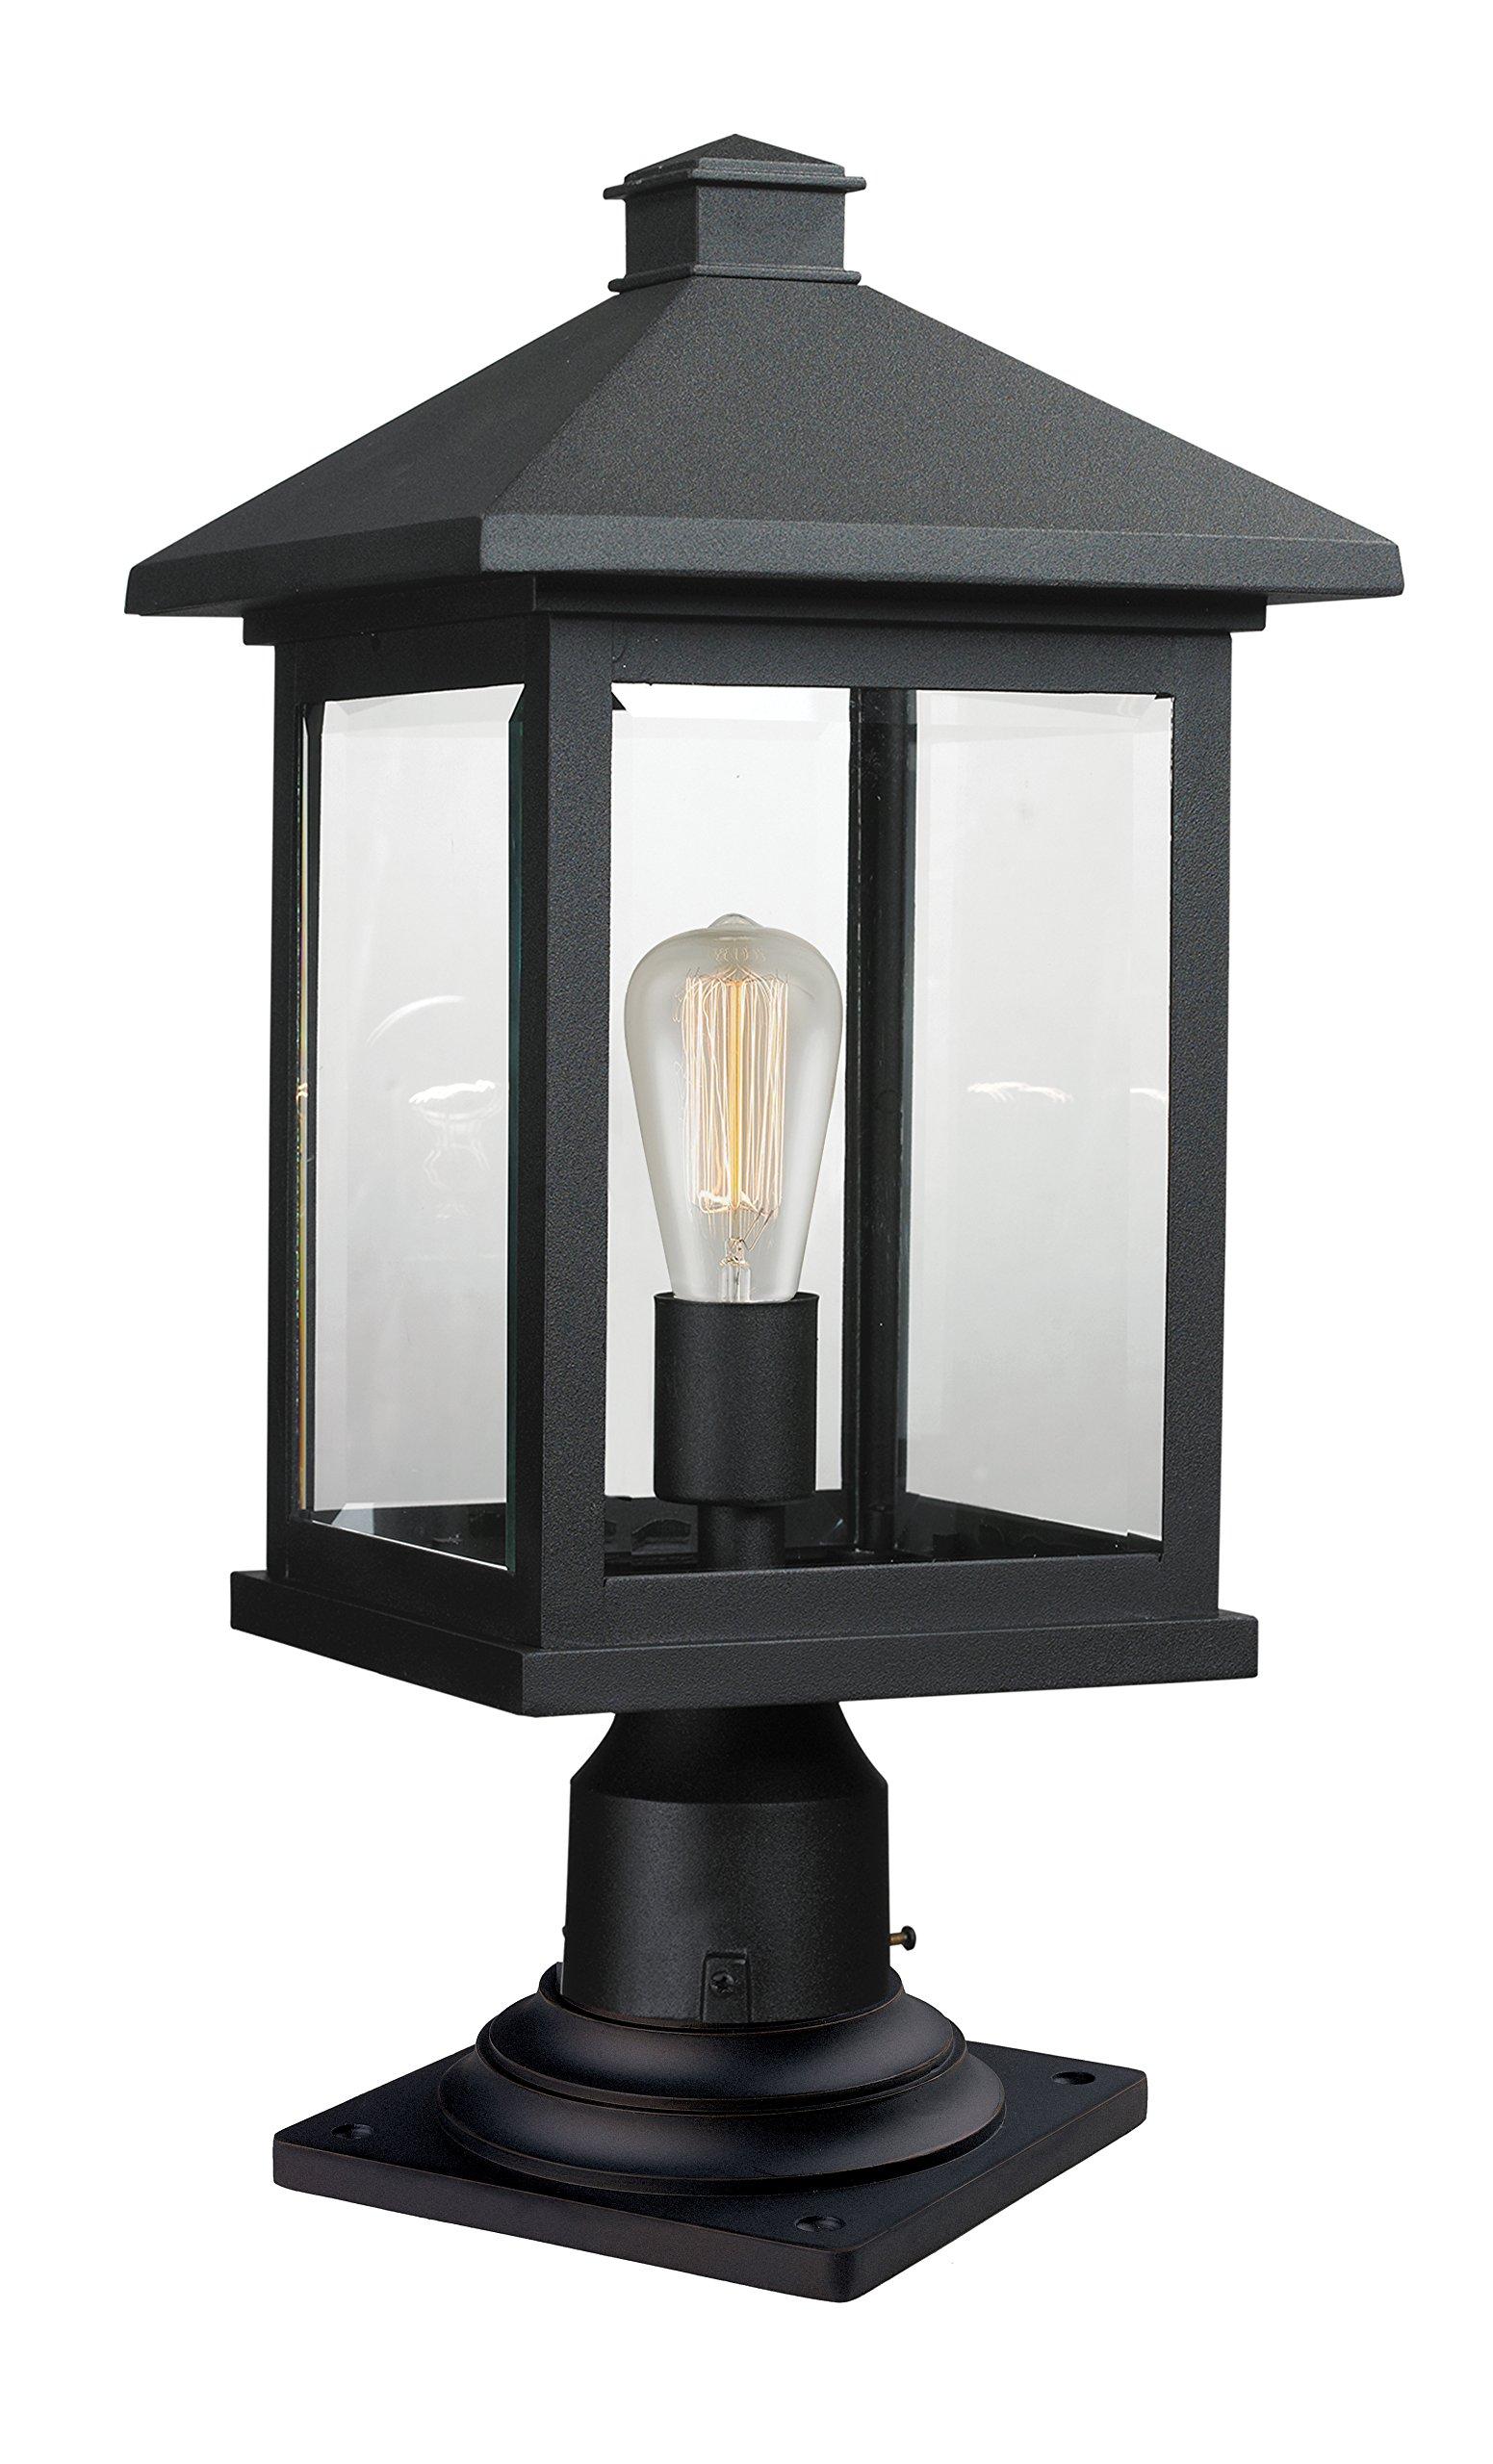 Z-Lite 531PHBR-533PM-BK 1 Outdoor Pier Mount Light, Black